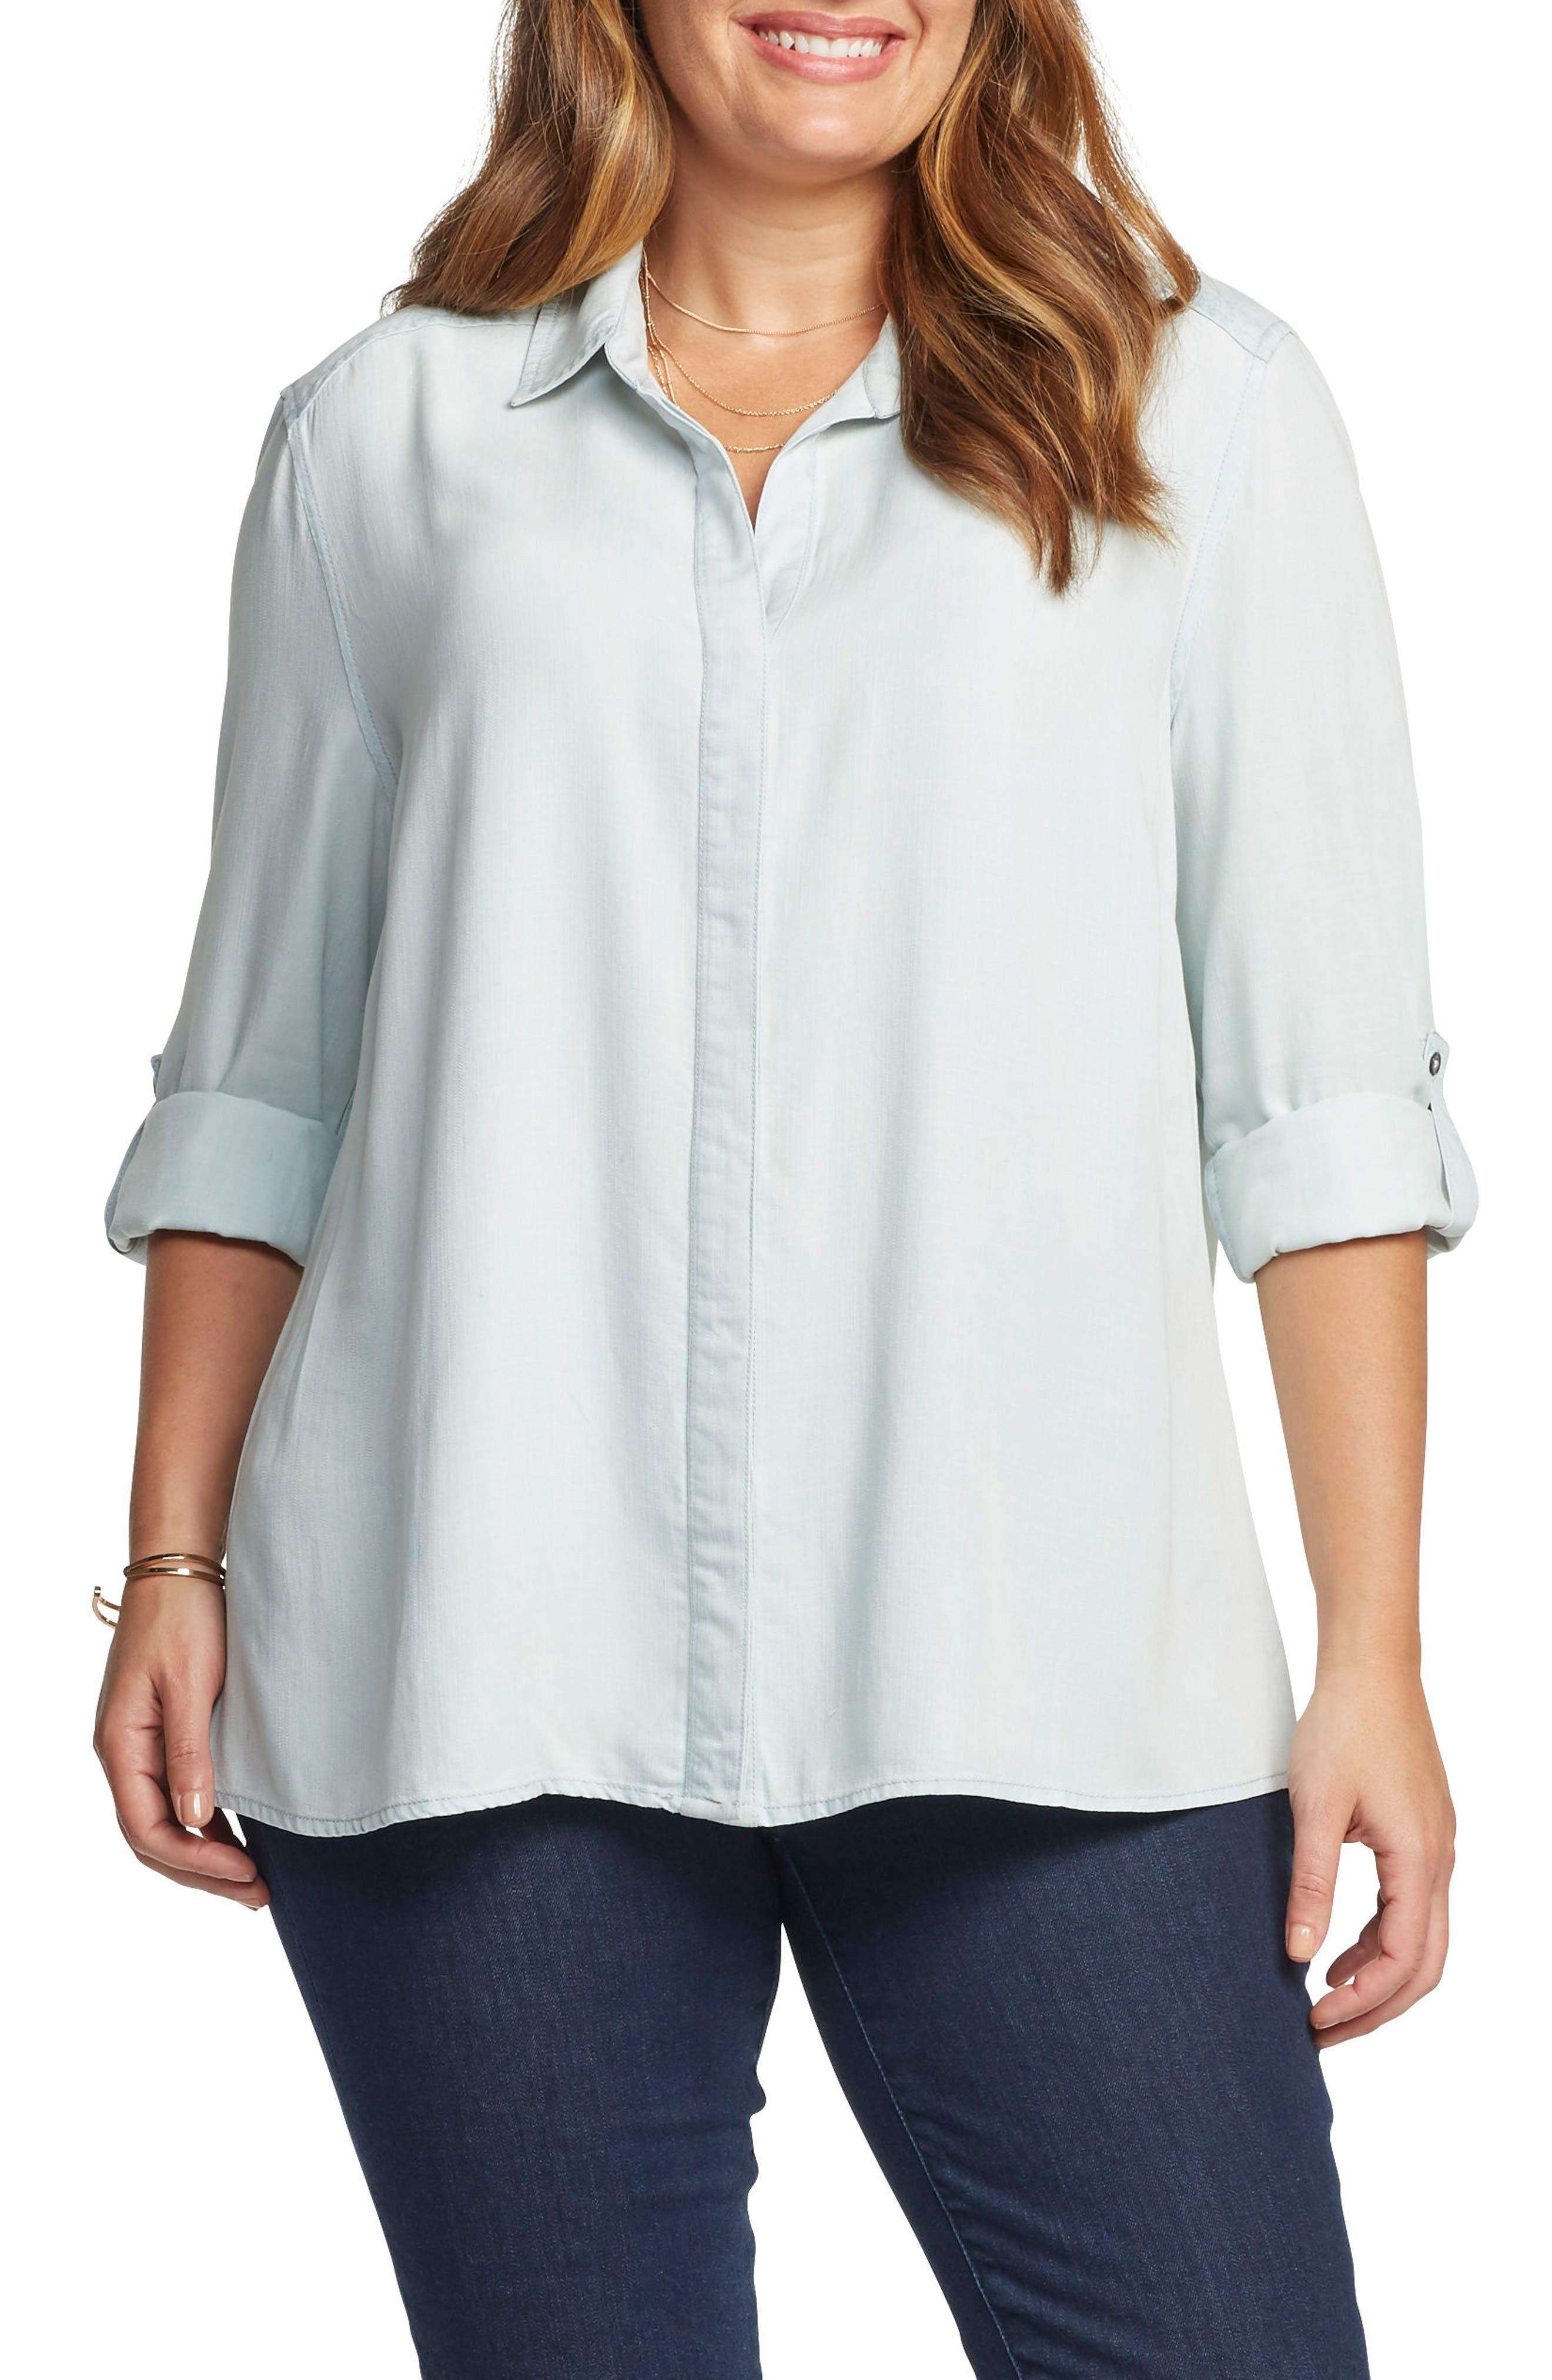 TART Caroline Roll Sleeve Top, Main, color, 451